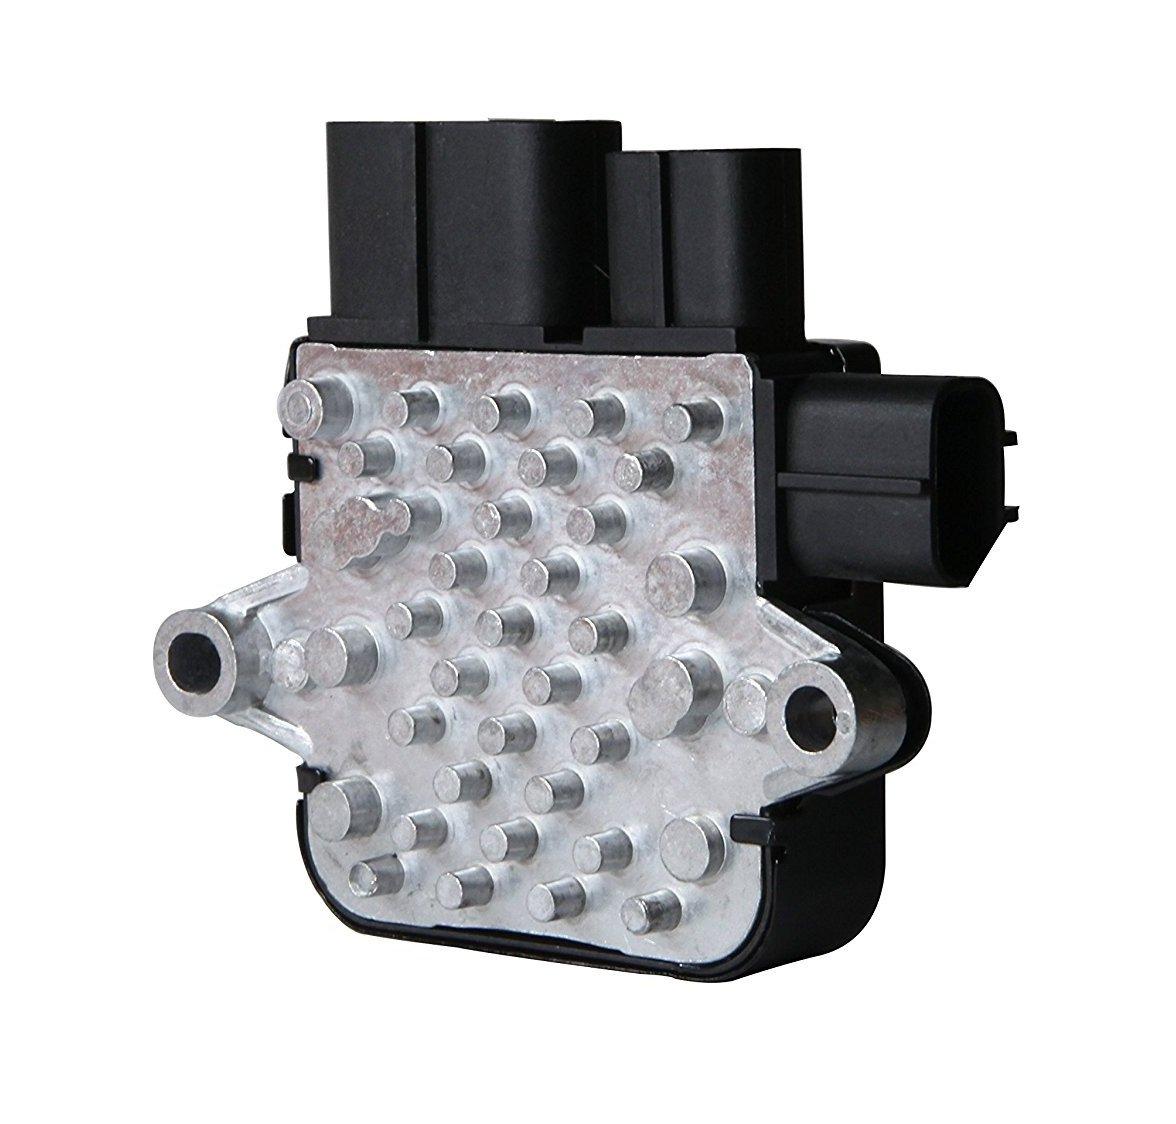 HVAC Blower Motor Resistor G018R Radiator Cooling Fan Control Unit Module for Mitsubishi Outlander Lancer (Non-Turbo) Mazda 6 MPV(Replaces# 1C23219700, AJY215SC0, AJ511515YA) GOHAWKTEQ